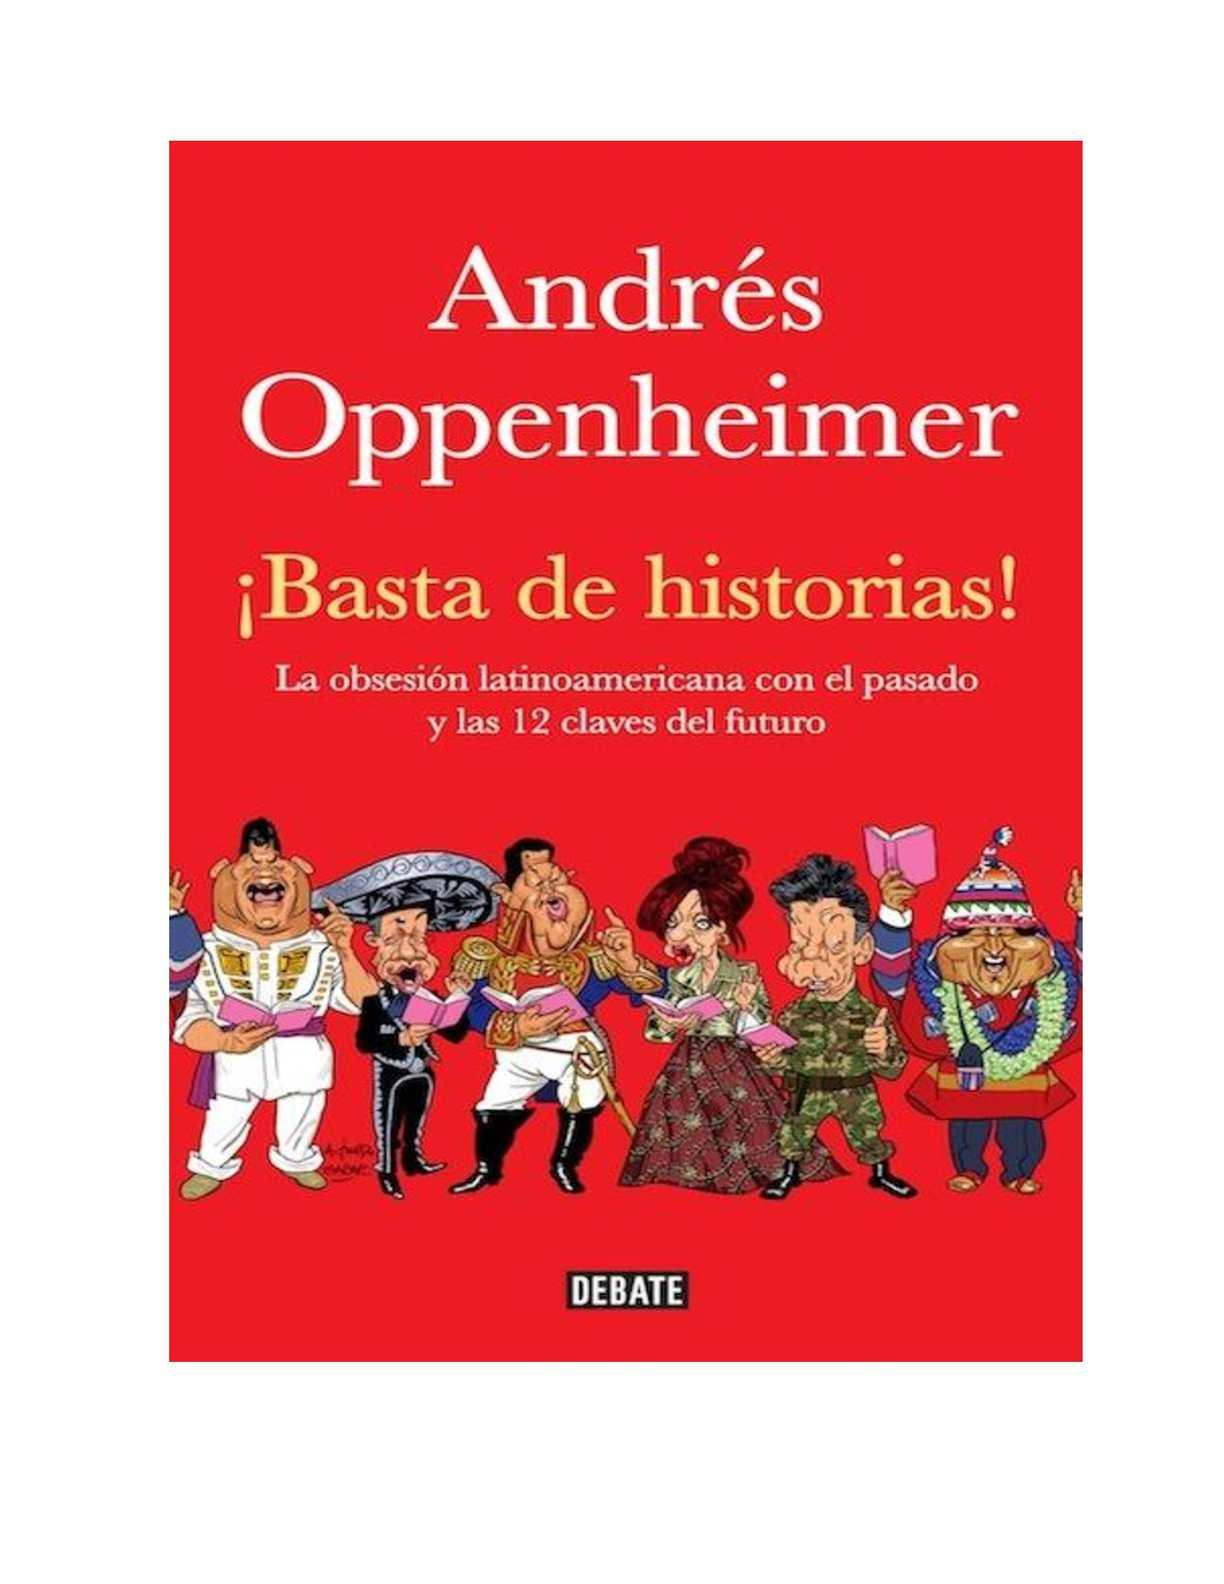 Calaméo - GI - ANDRES OPPENHEIMER - BASTA DE HISTORIAS